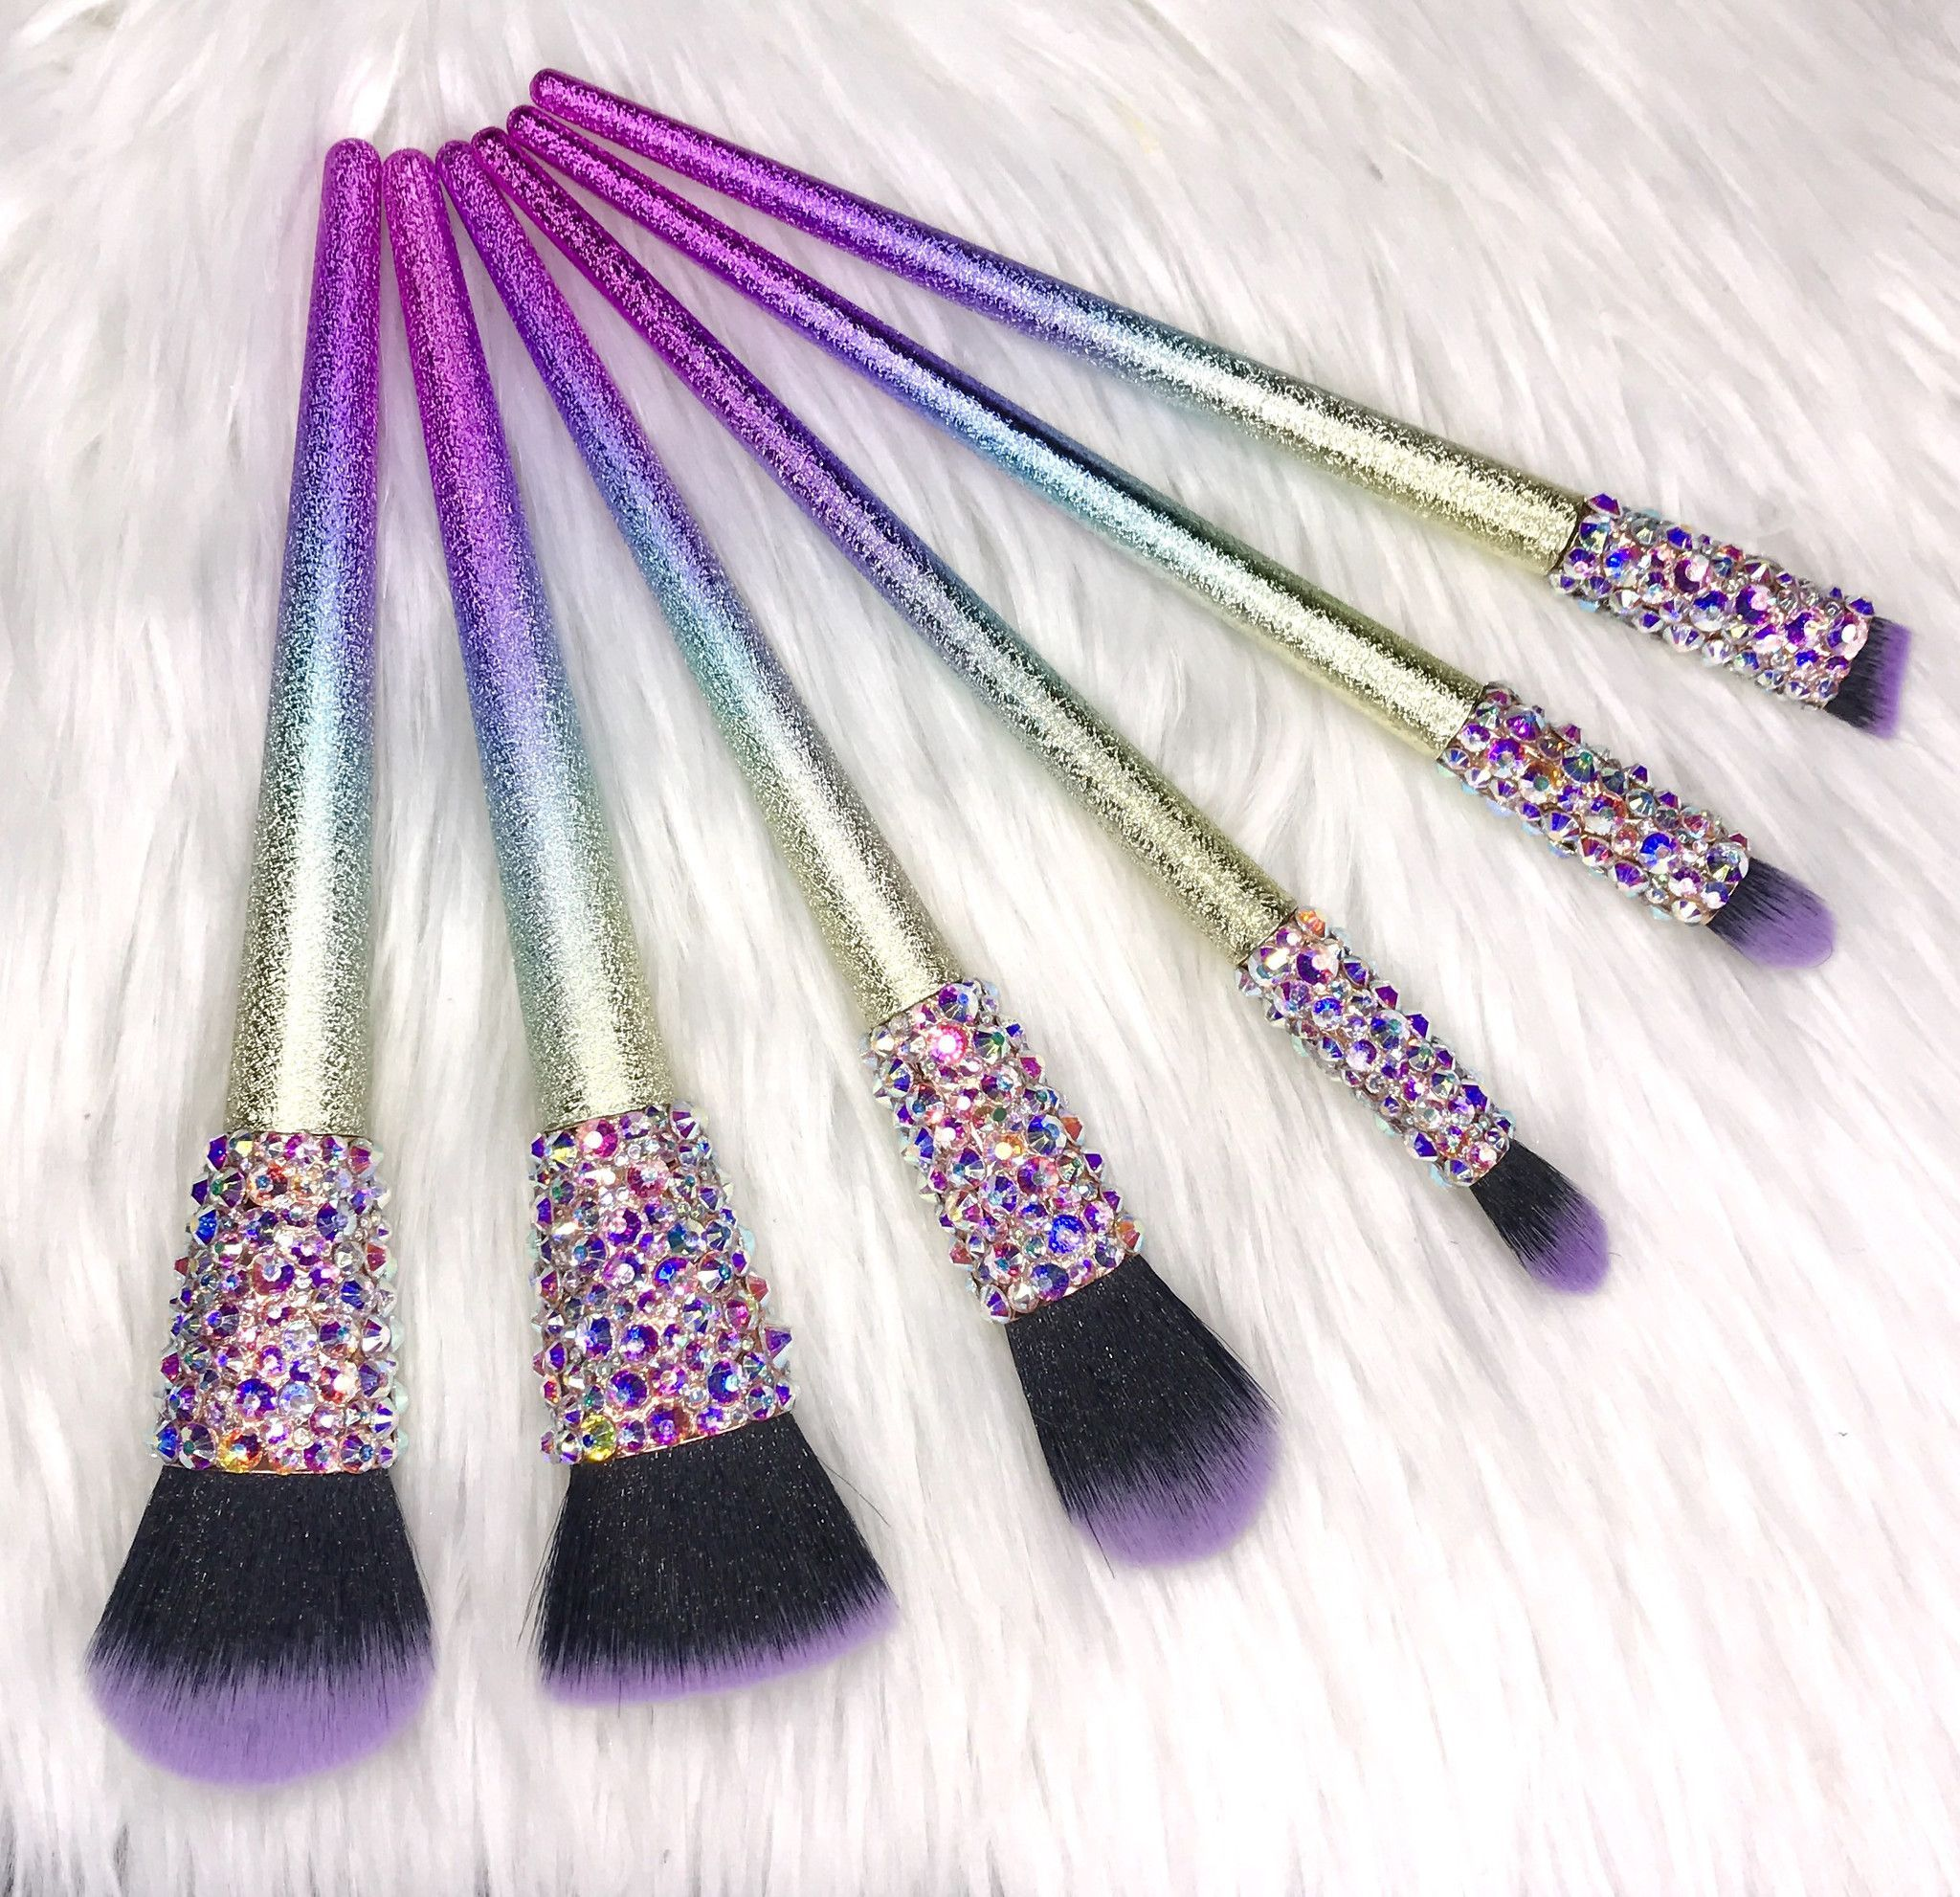 Swarovski Rainbow Glitter Makeup Brush Set (With images